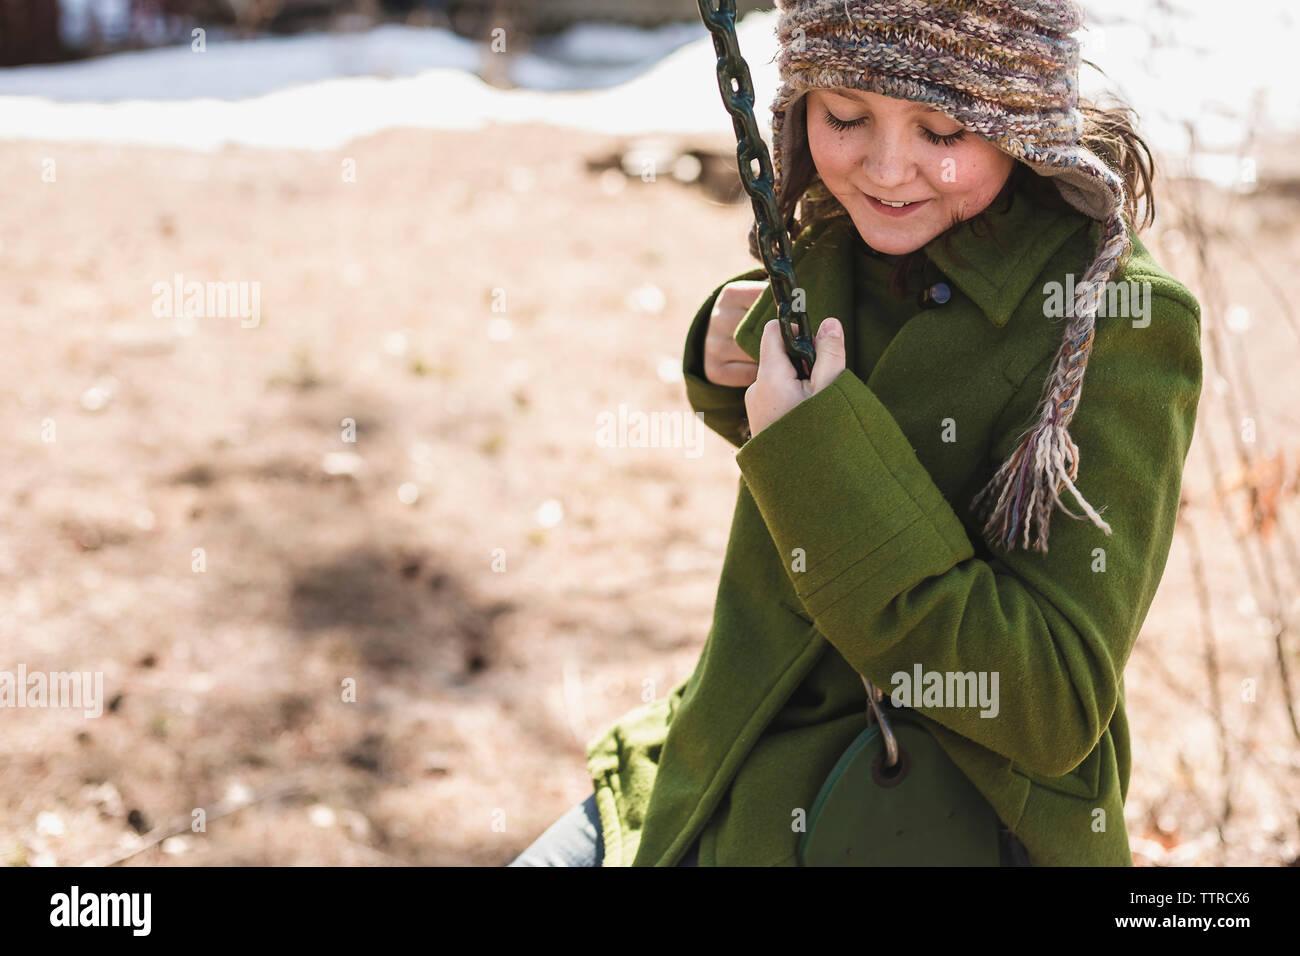 Smiling girl swinging at playground during winter - Stock Image